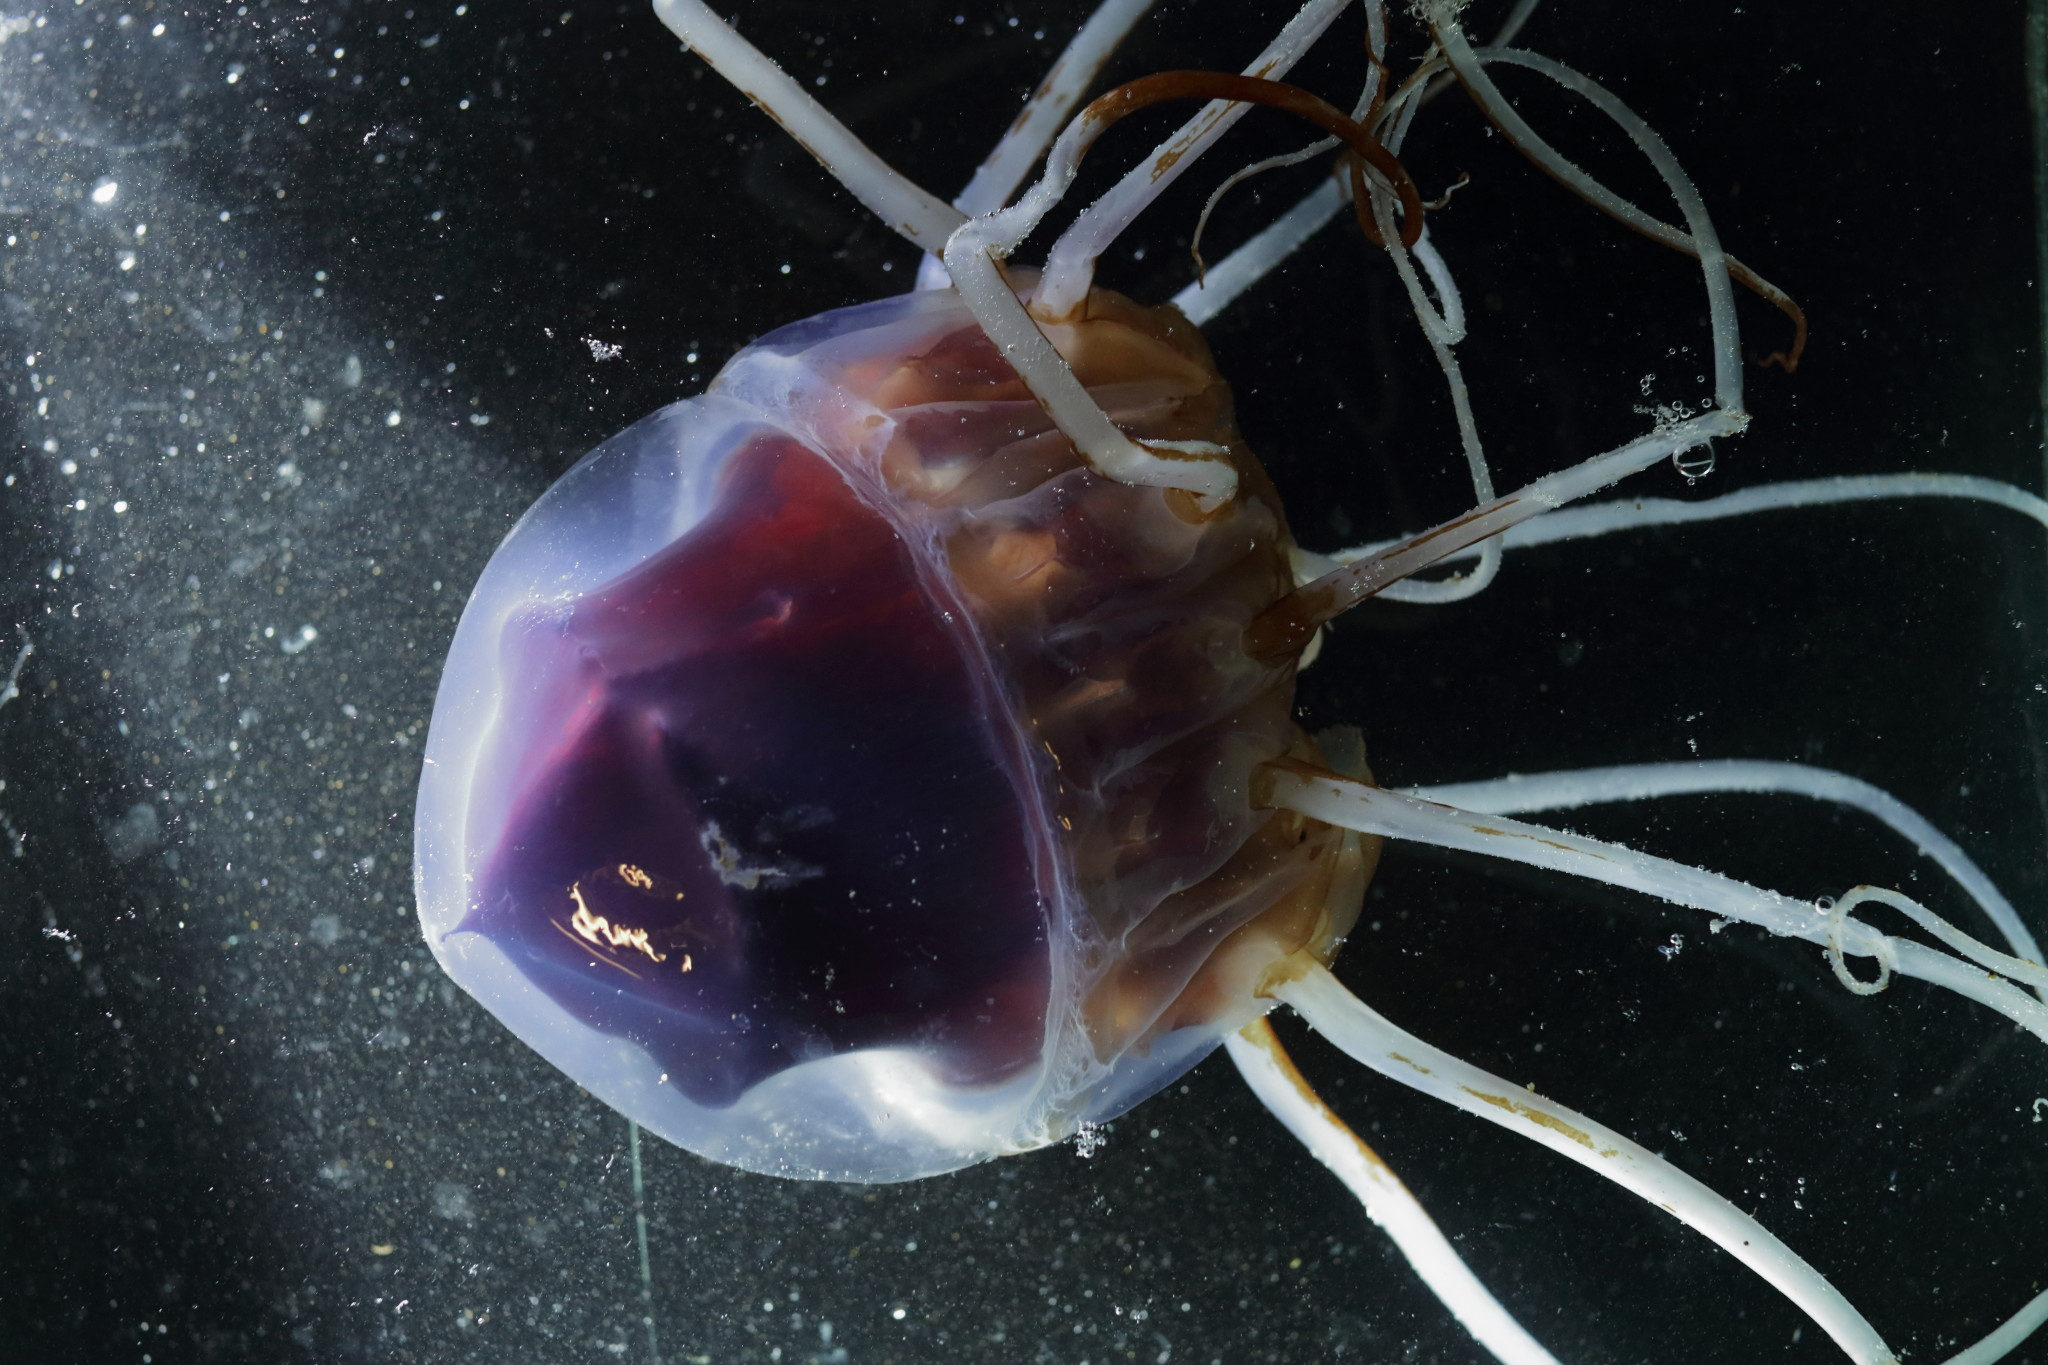 Helmet Jellyfish (Periphylla periphylla)